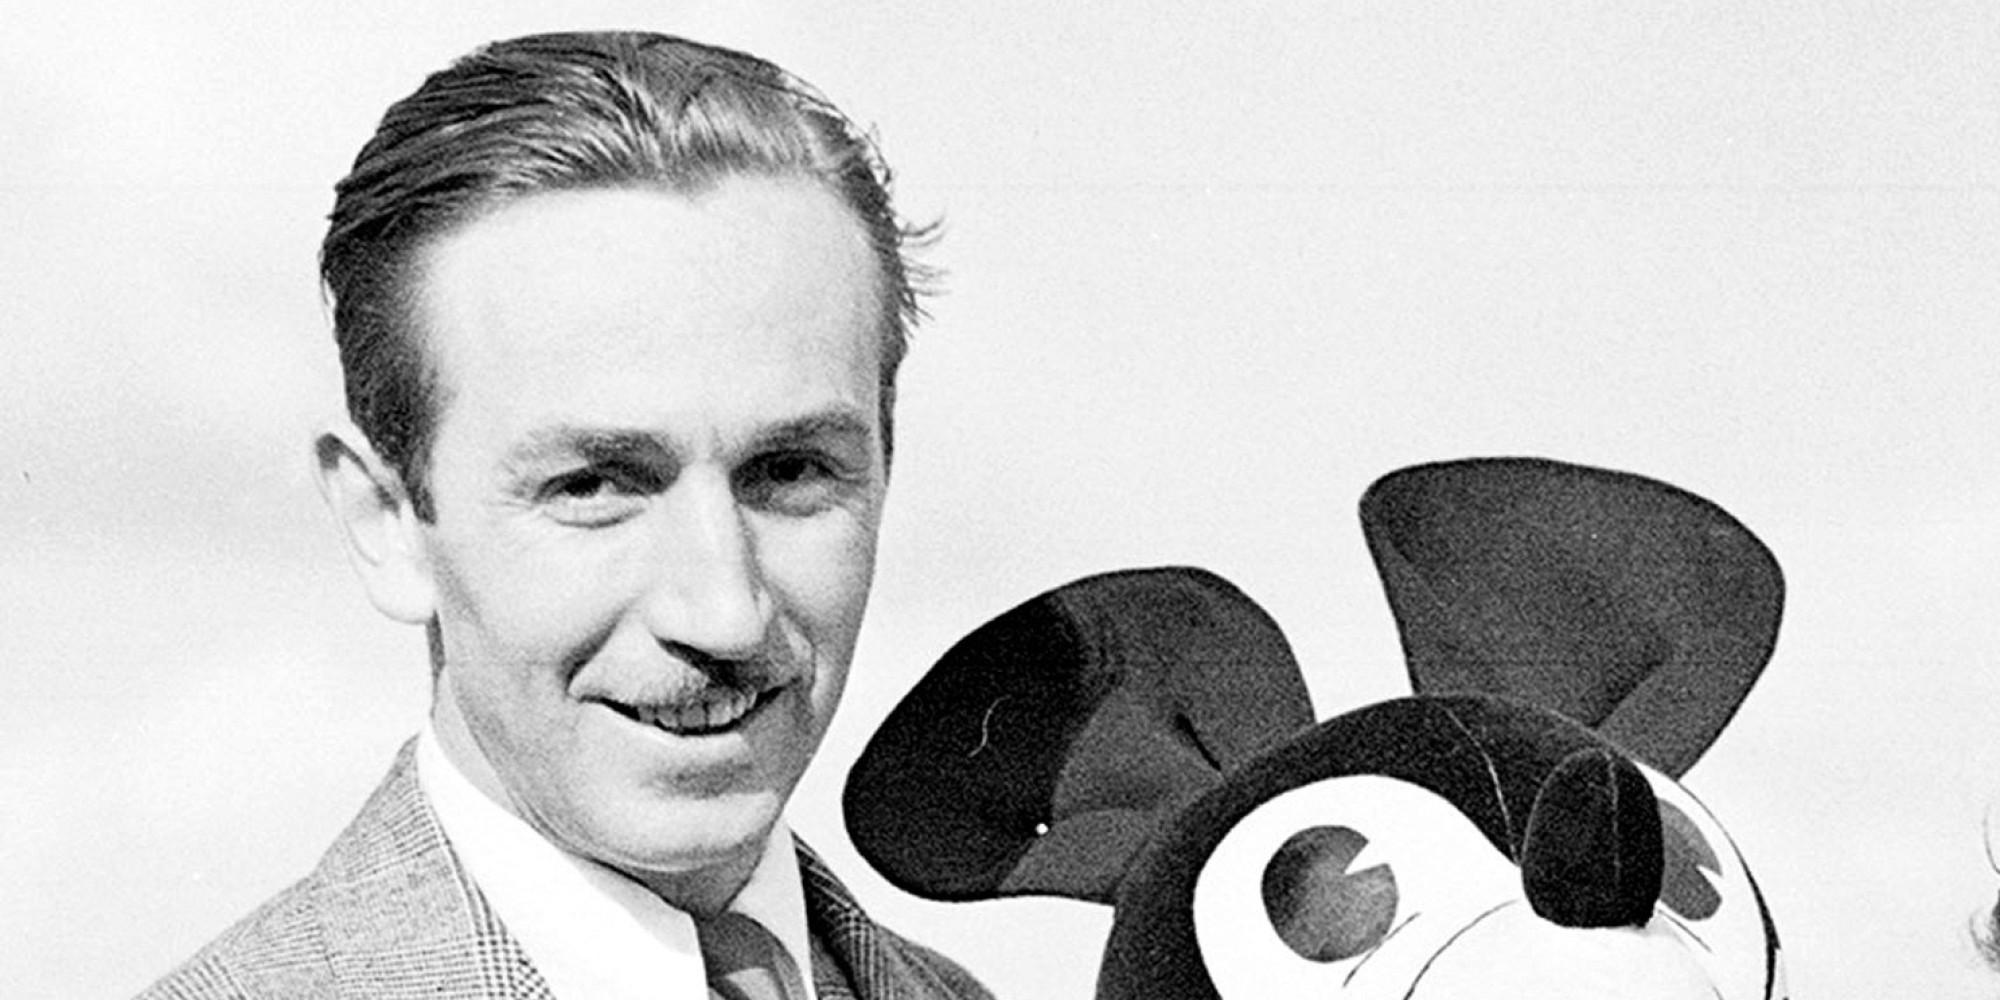 Walt Disney Photos Black And White Walt disneys chicago - o-WALT-DISNEY-facebook